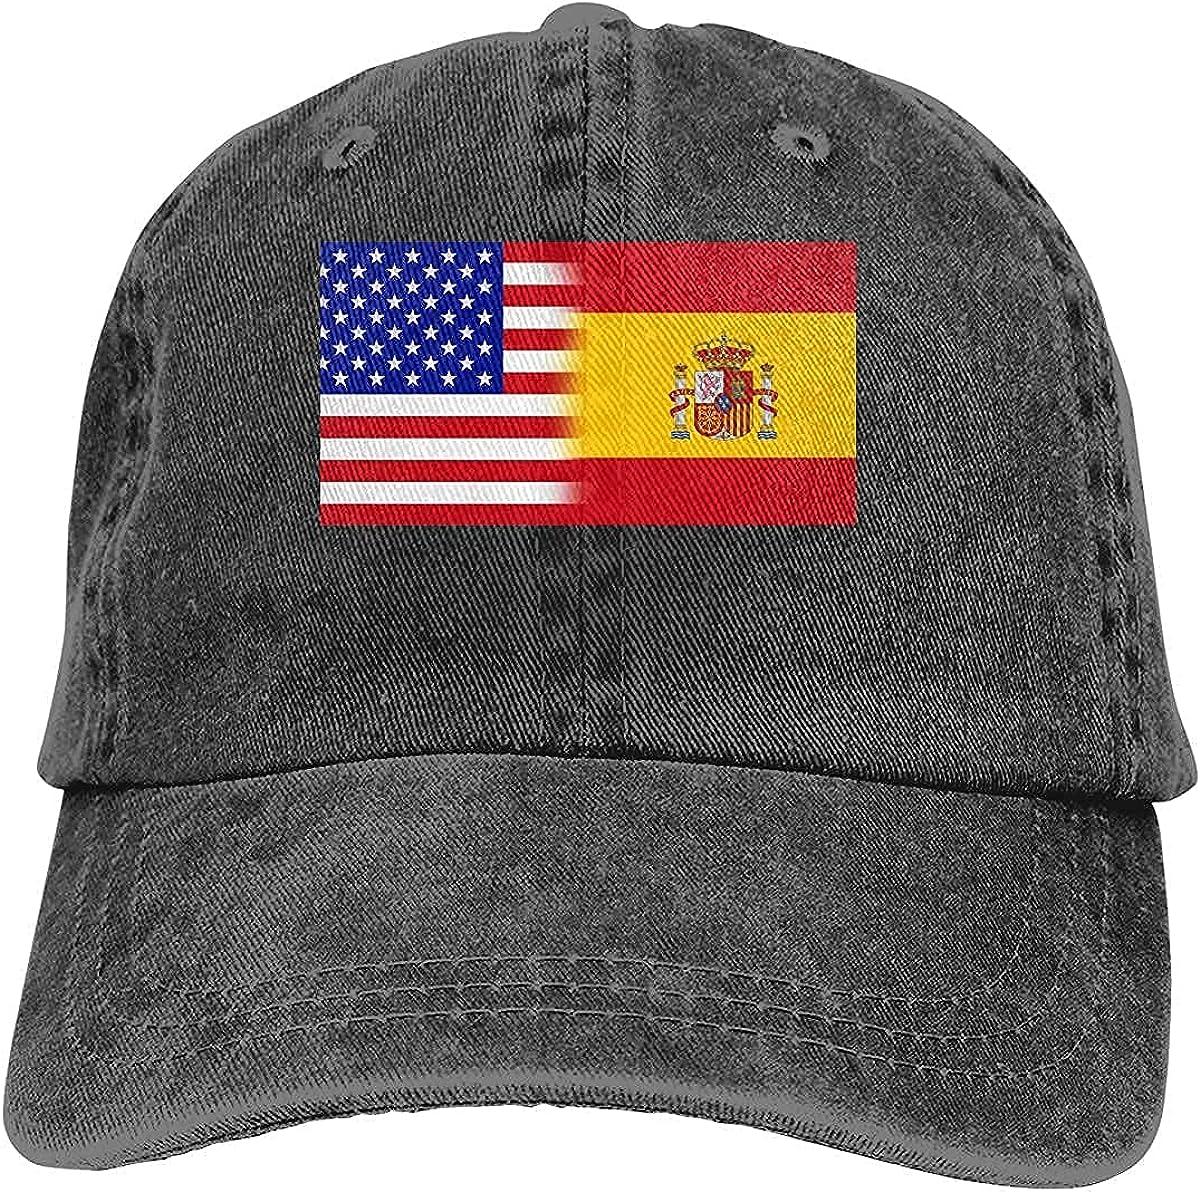 Mixed USA Spain Flag Baseball Cap, Adjustable Size Dad Hat, Vintage Baseball Hats for Men Woman